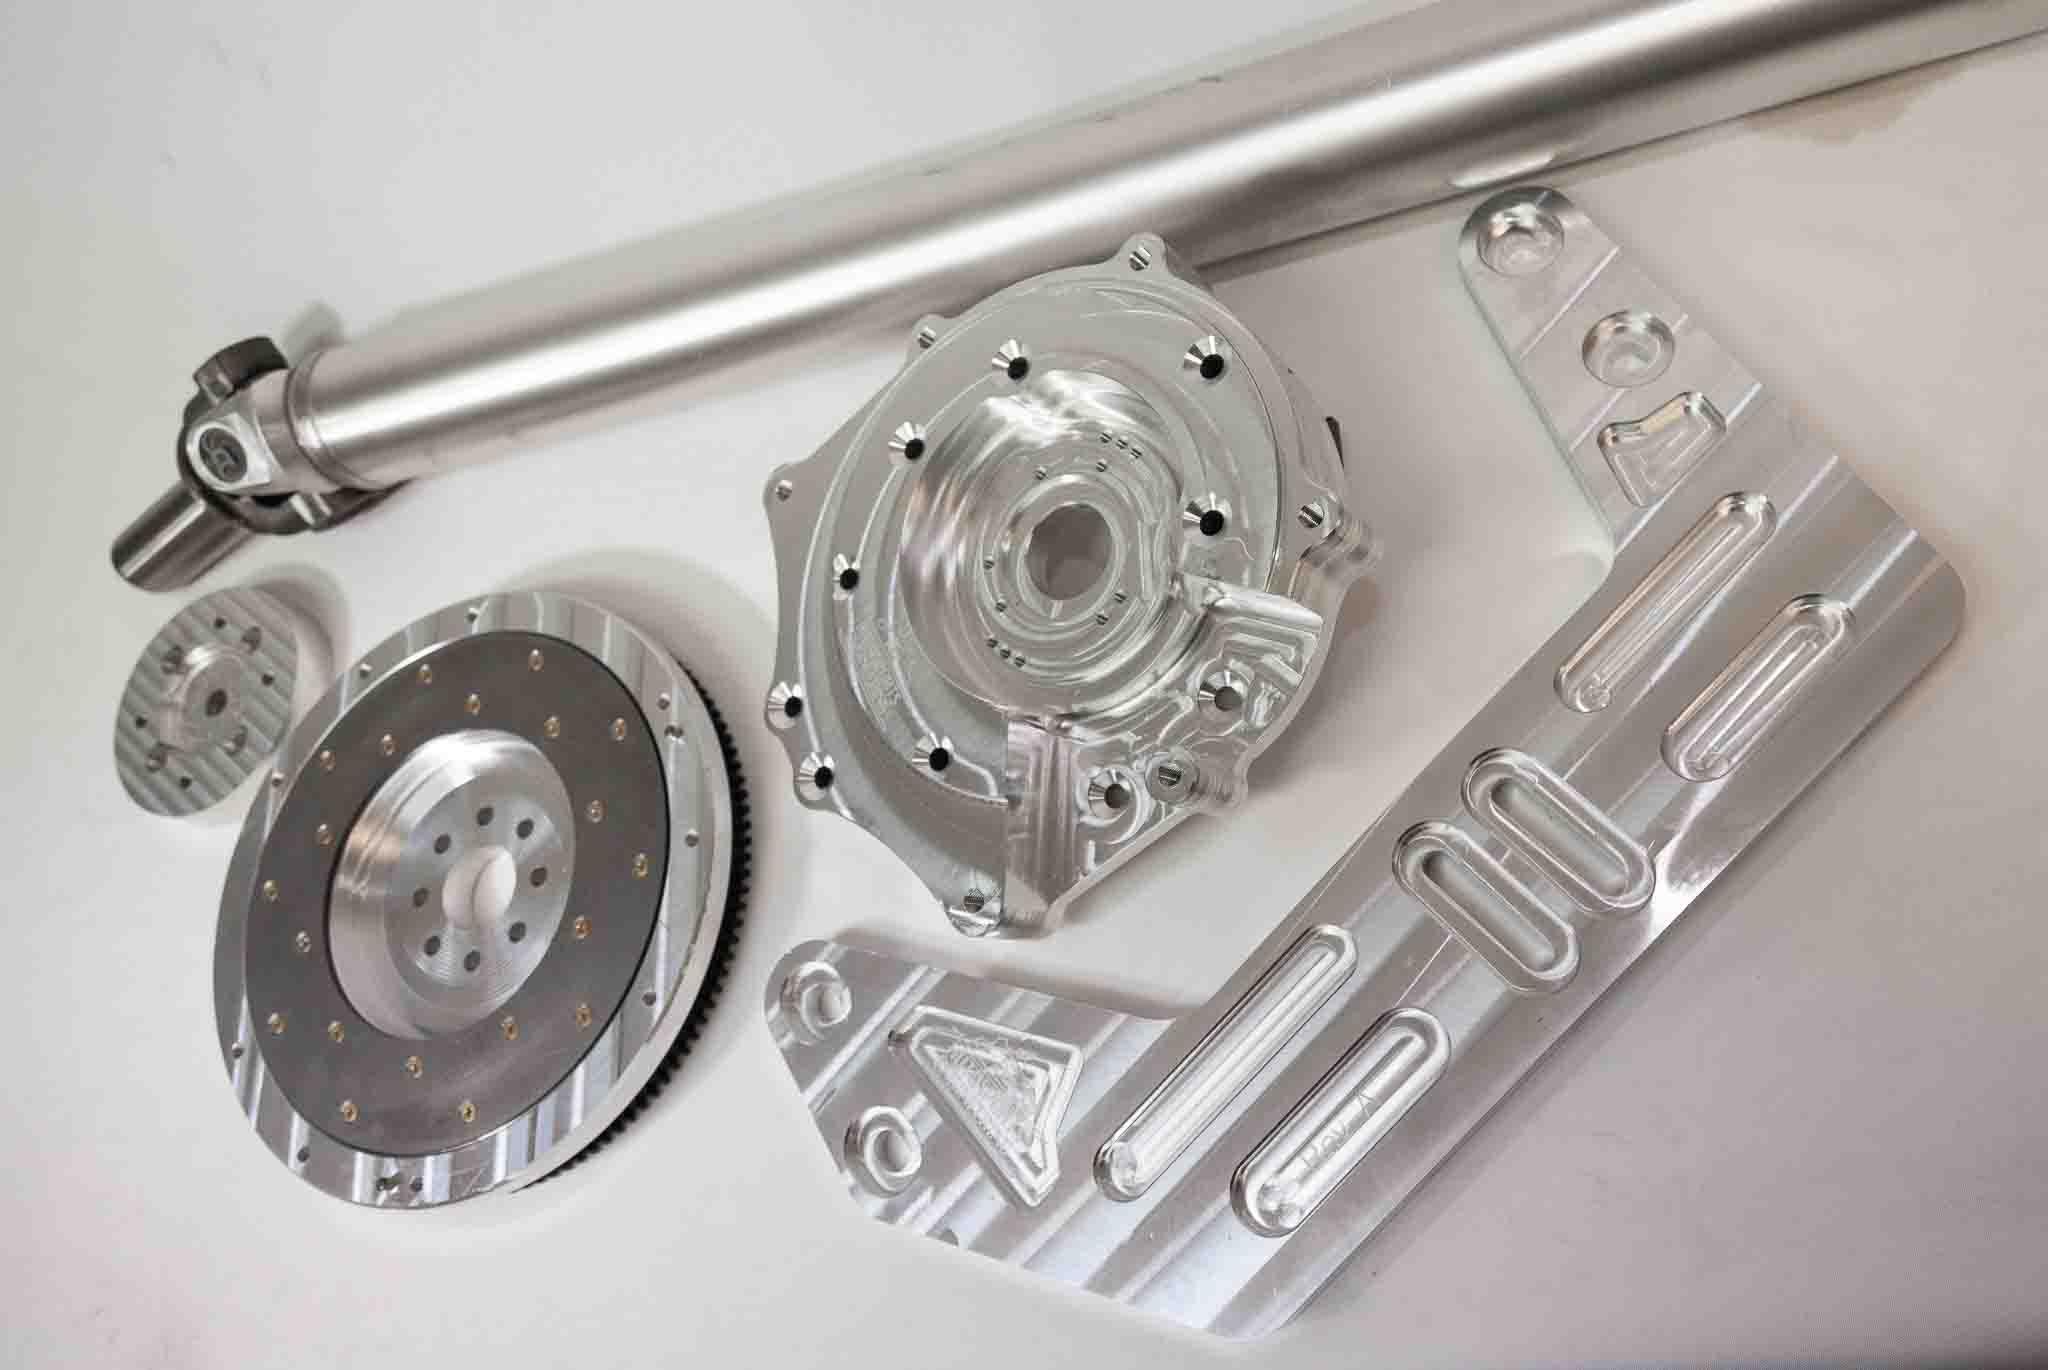 Autosports Engineering 2JZGTE 2JZ 1JZ 2JZGE Engine to 350Z CD009 6-speed  Transmission Adapter - Package